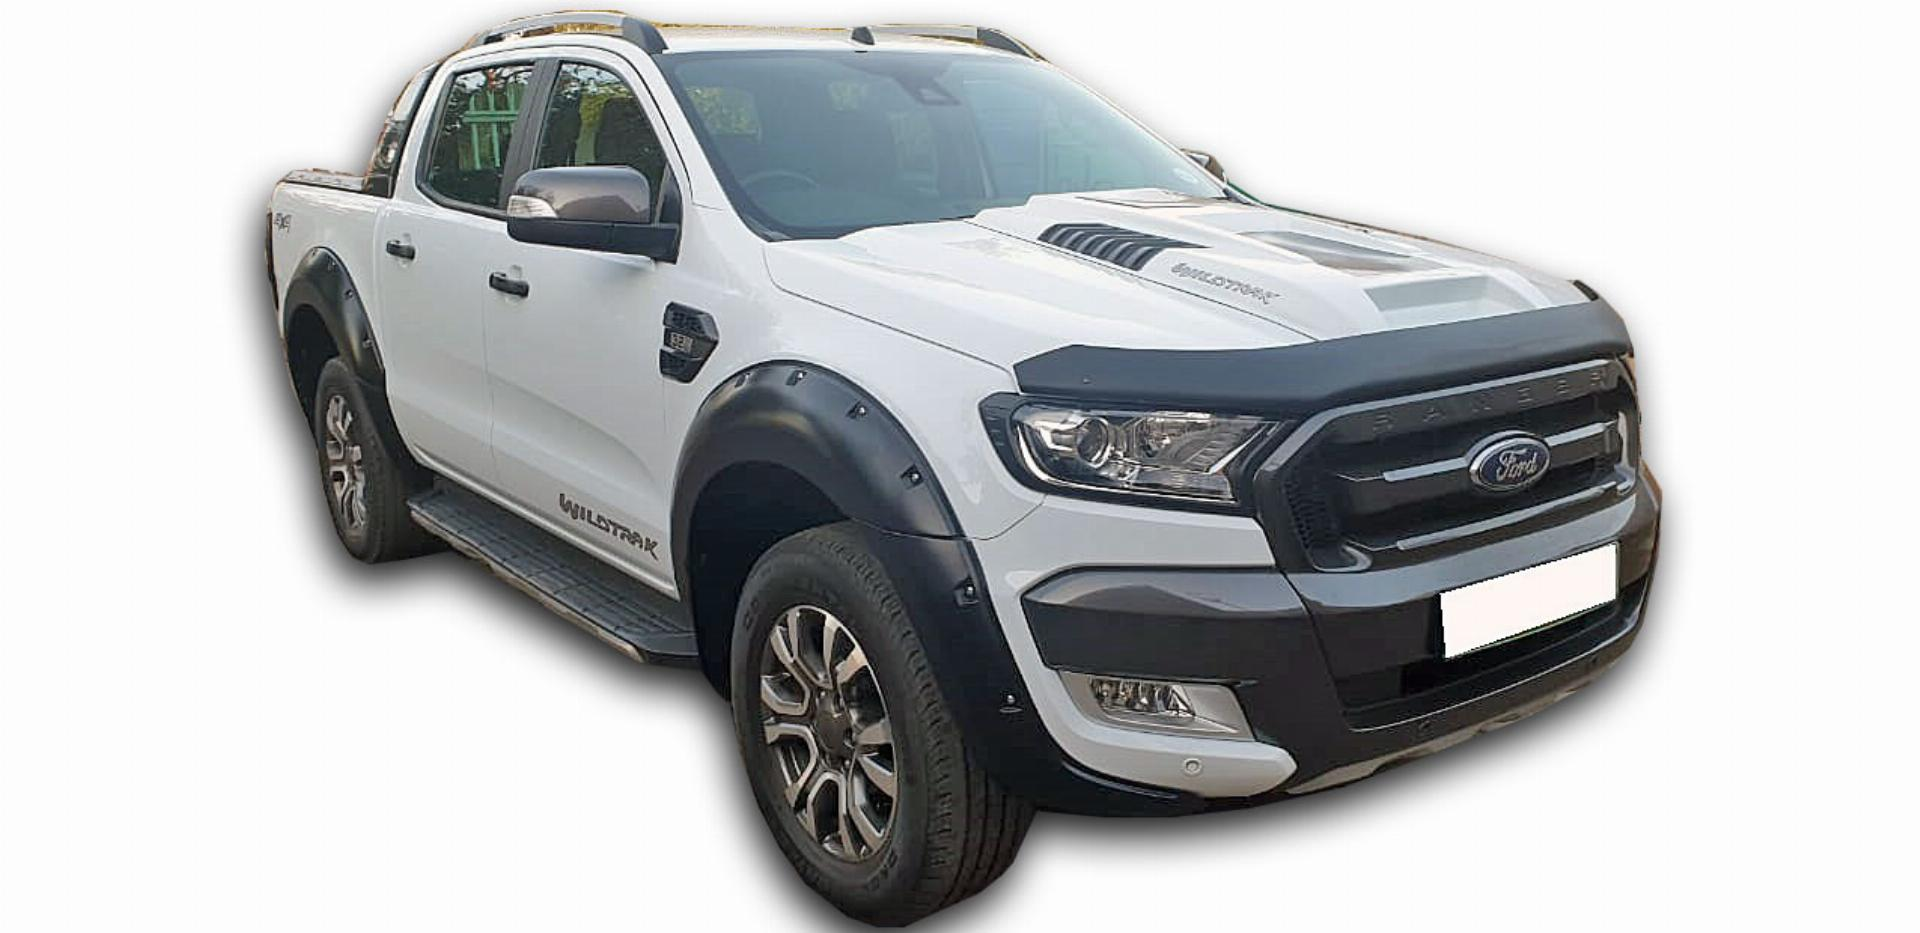 Ford Ranger 3.2 Wildtrack 4X4 Aut